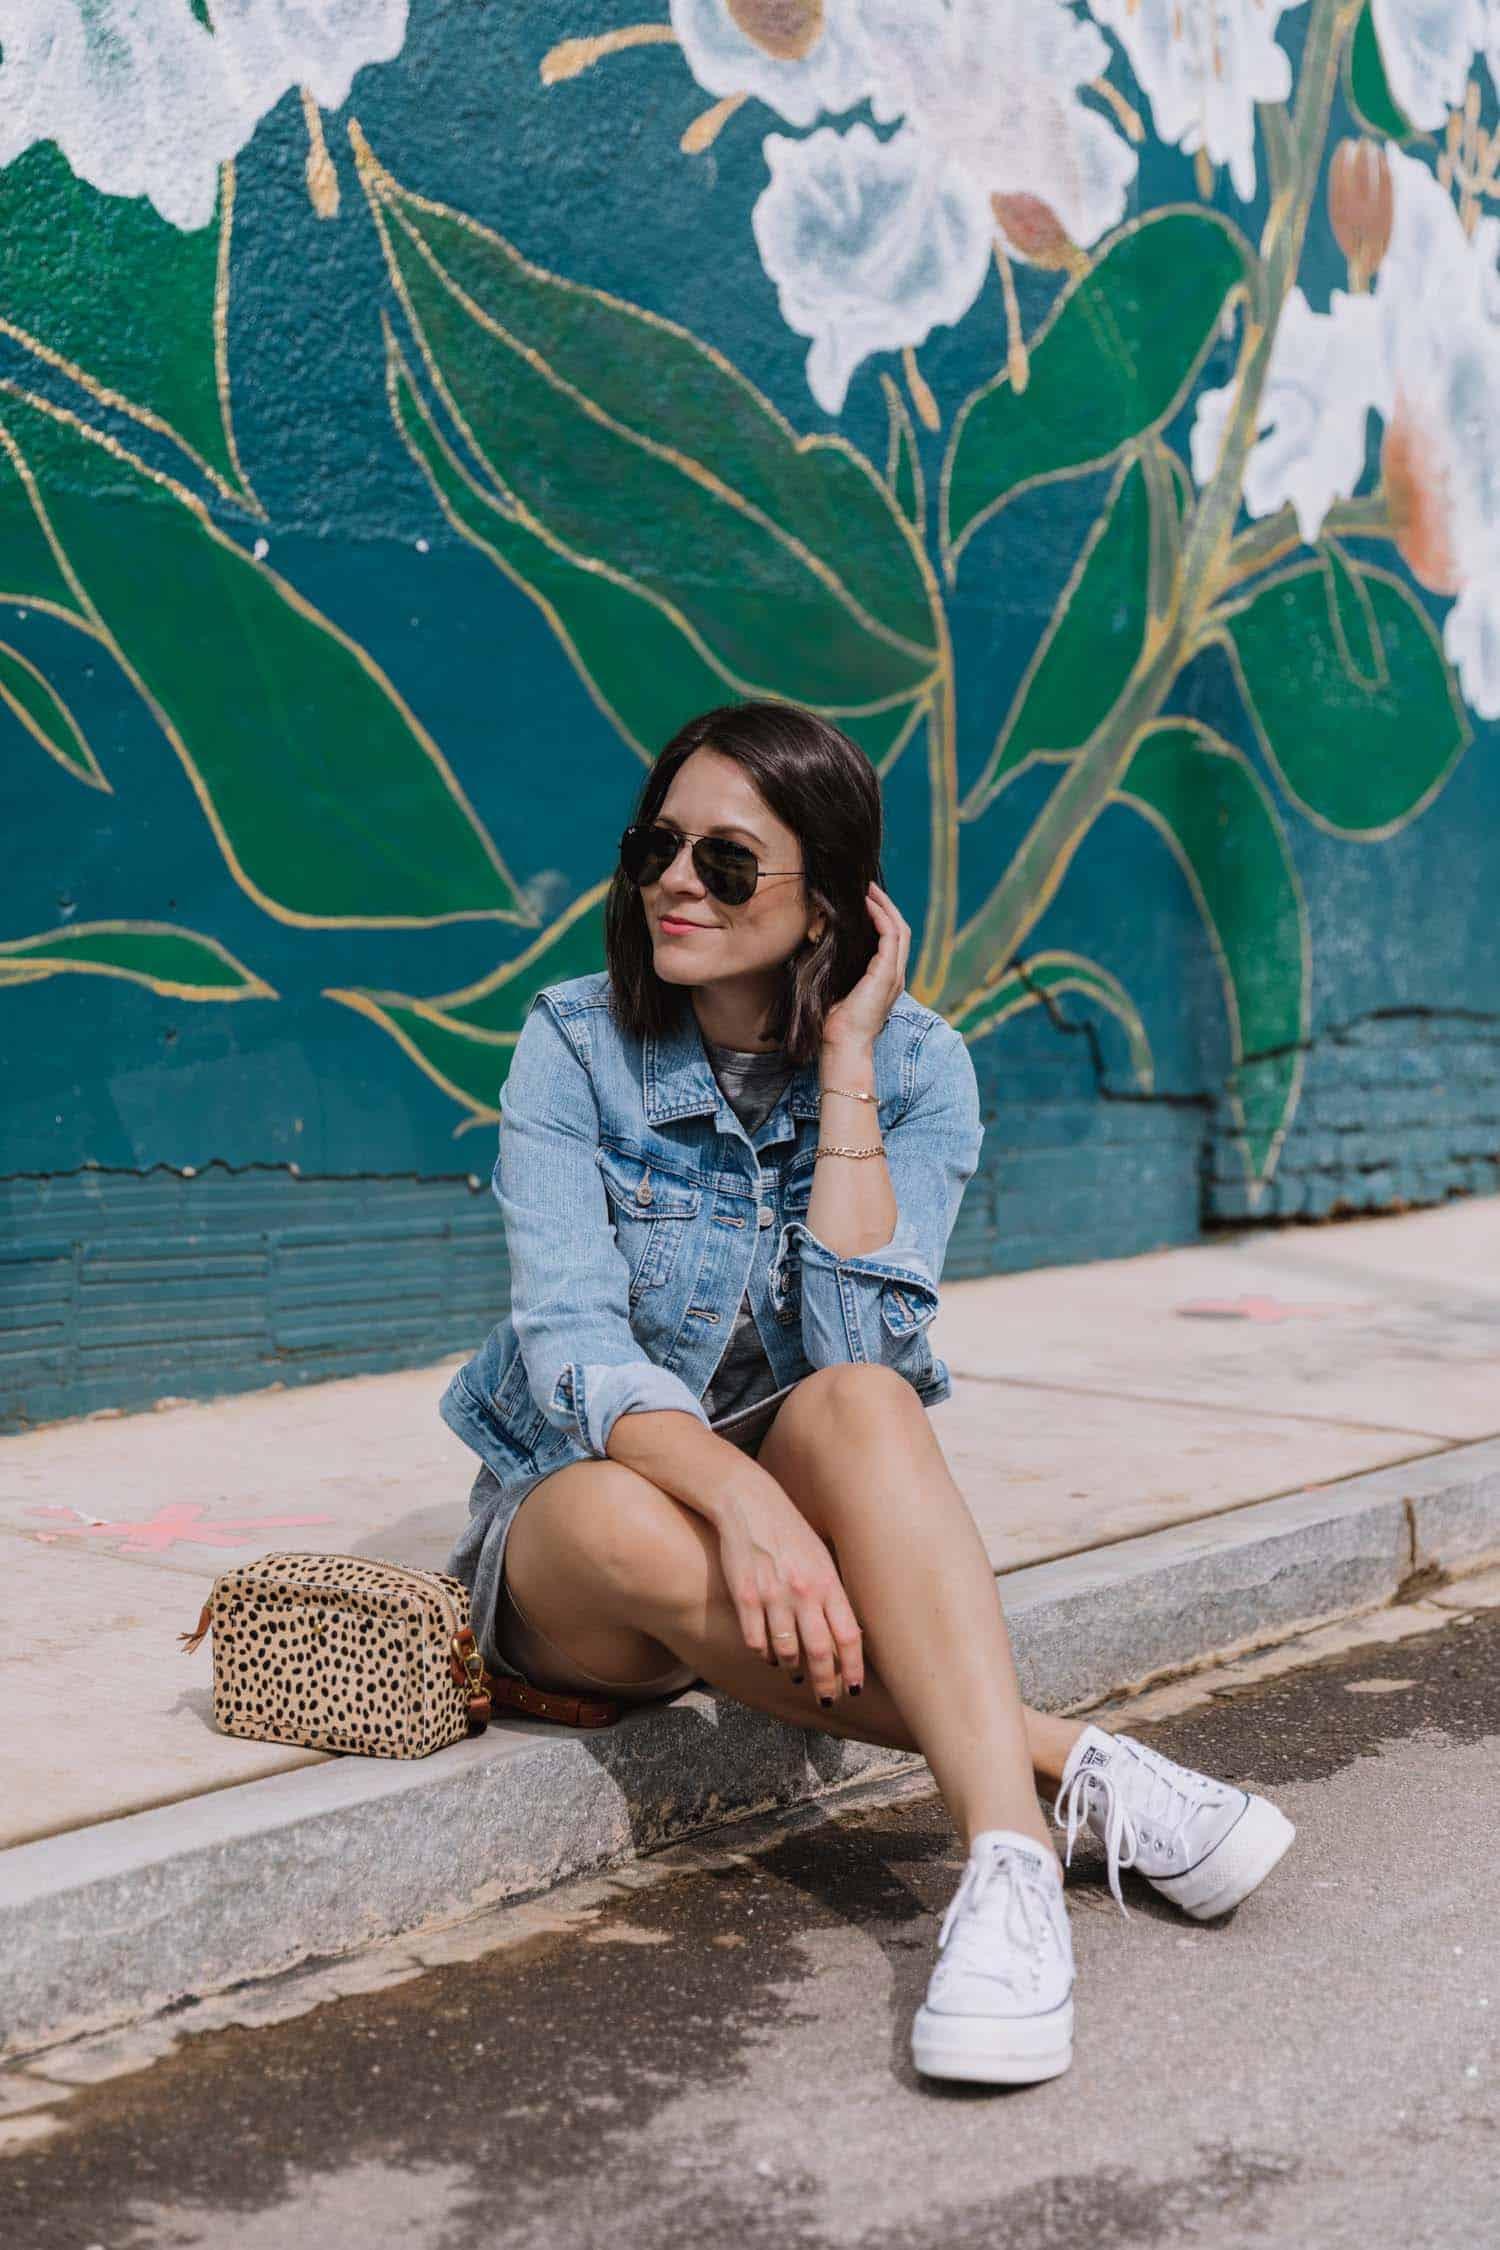 jessica camerata styles a t-shirt dress and denim jacket